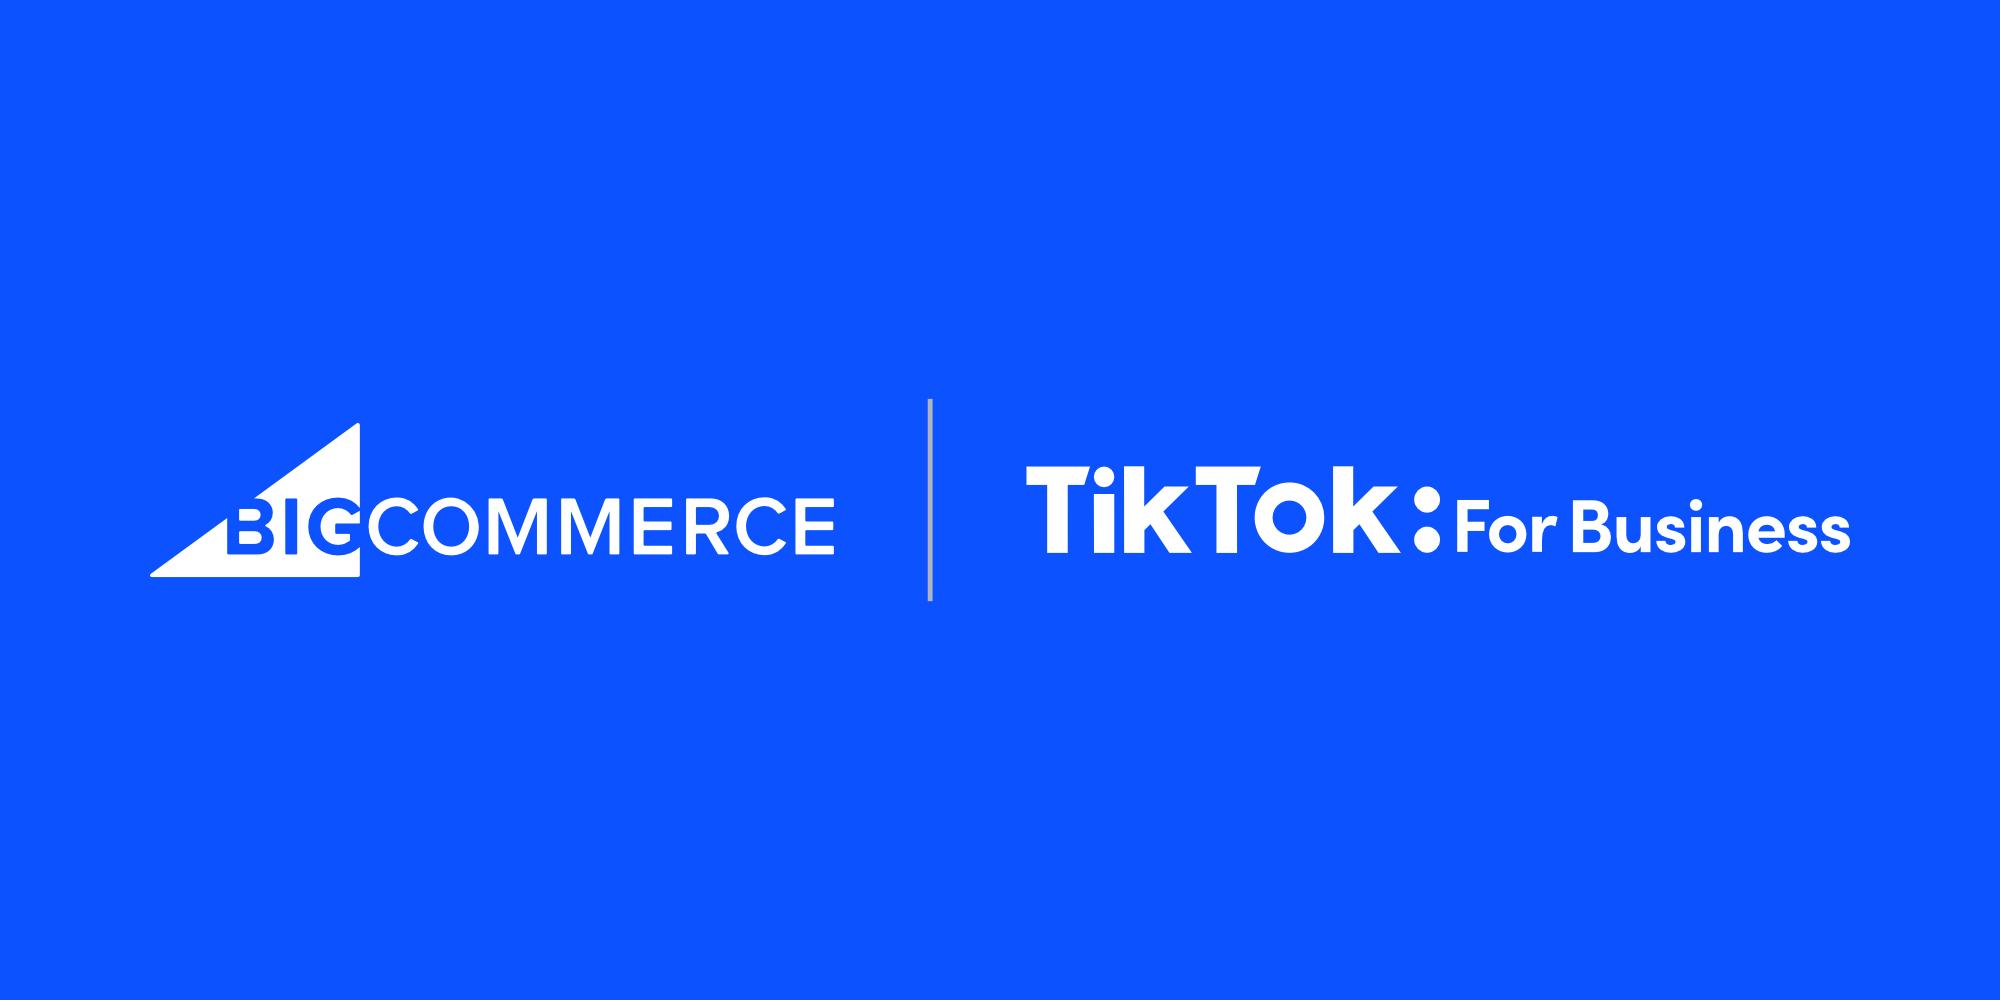 TikTik For Business